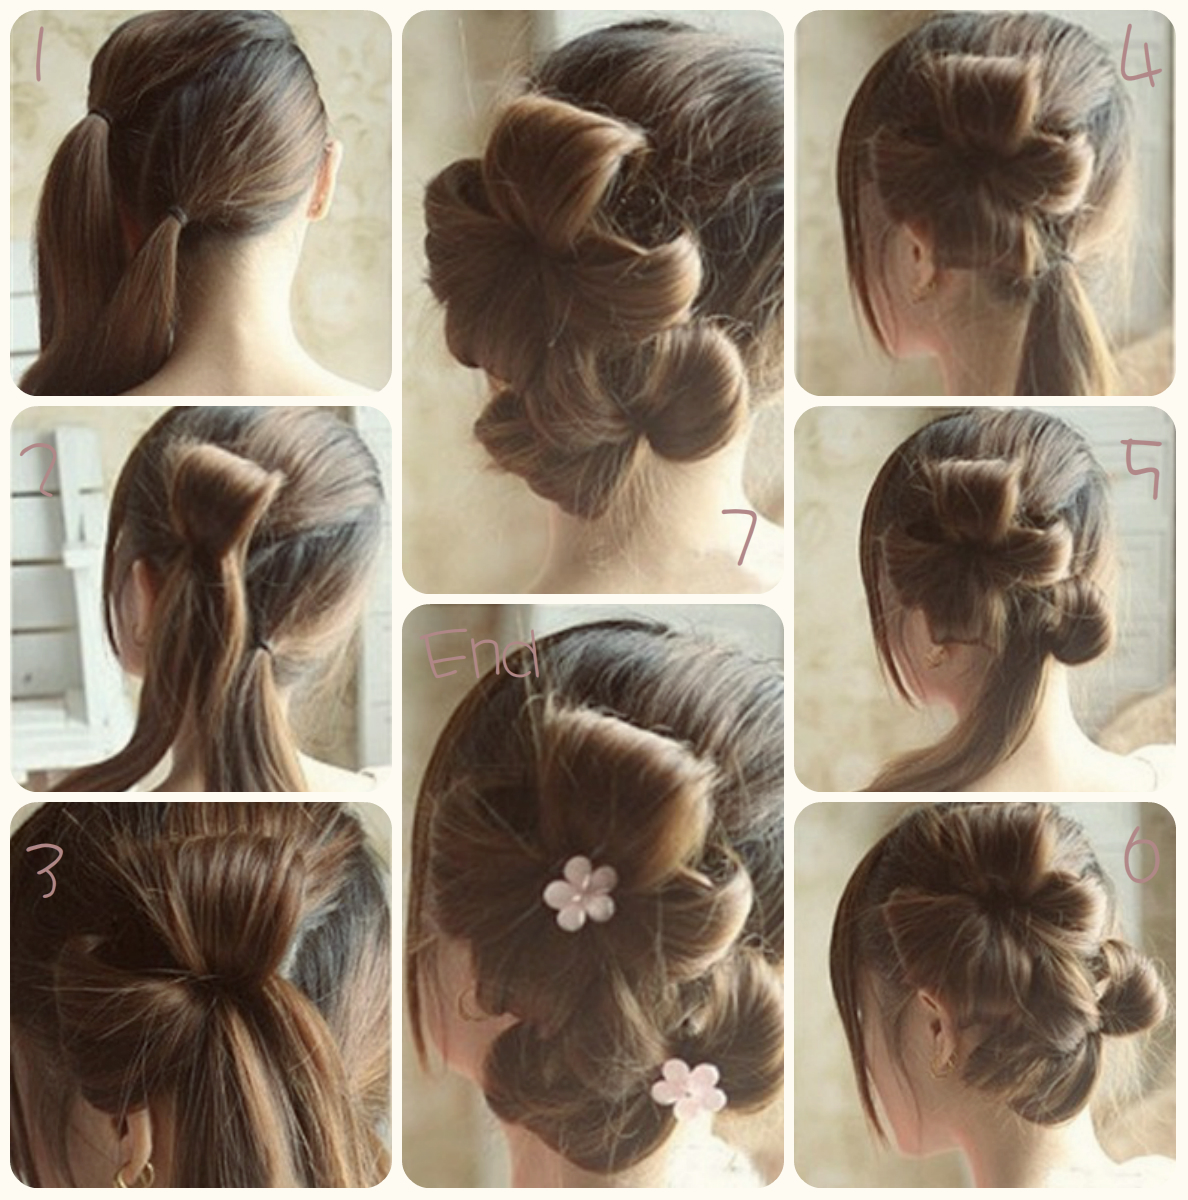 Flower Bun Hair Style Tutorial Step By Step B G Fashion